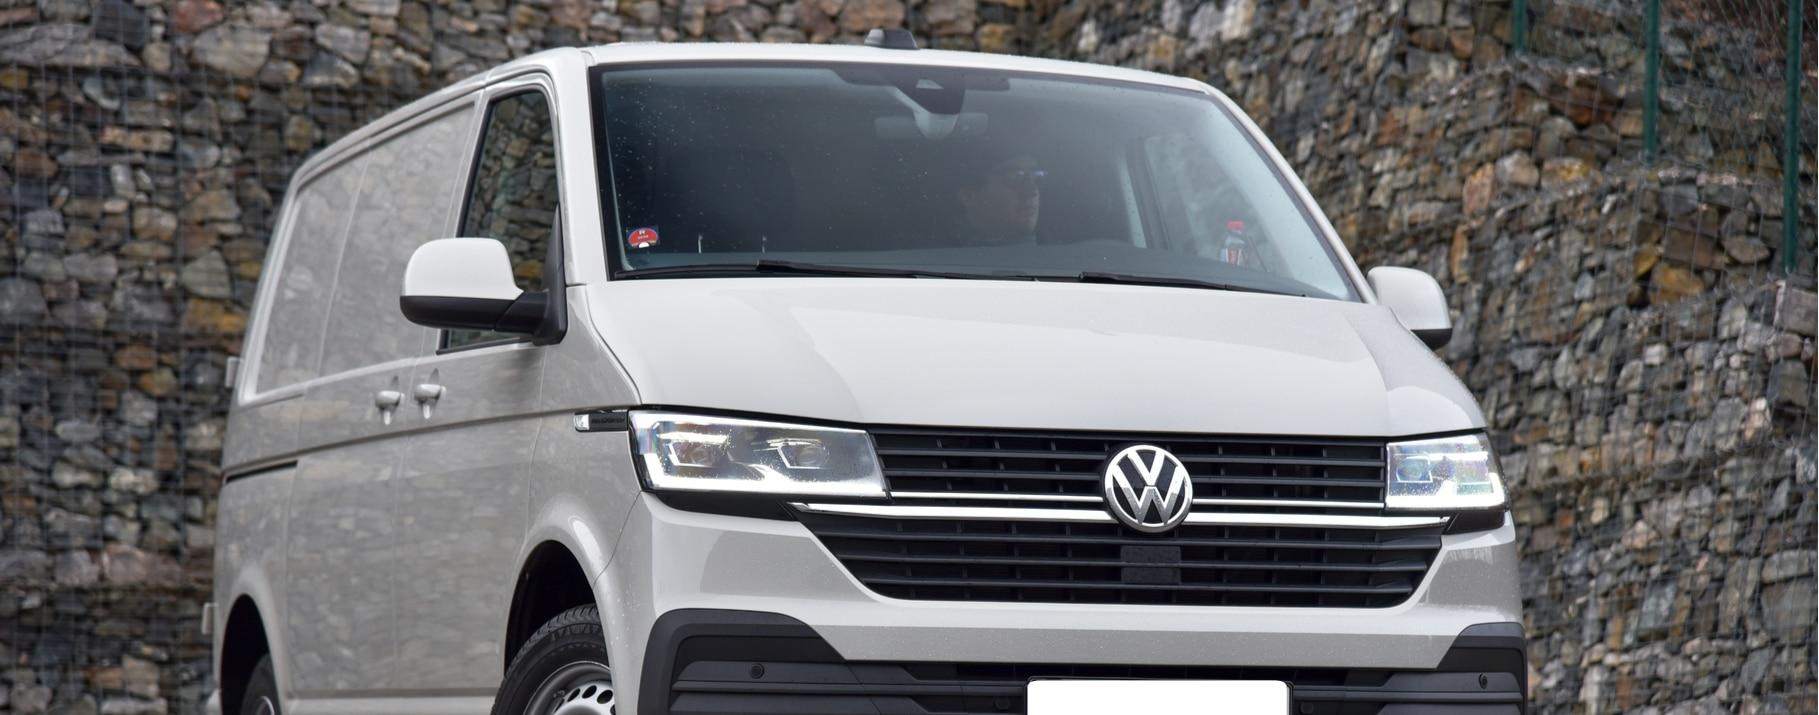 Quel véhicule utilitaire choisir en 2021 ?